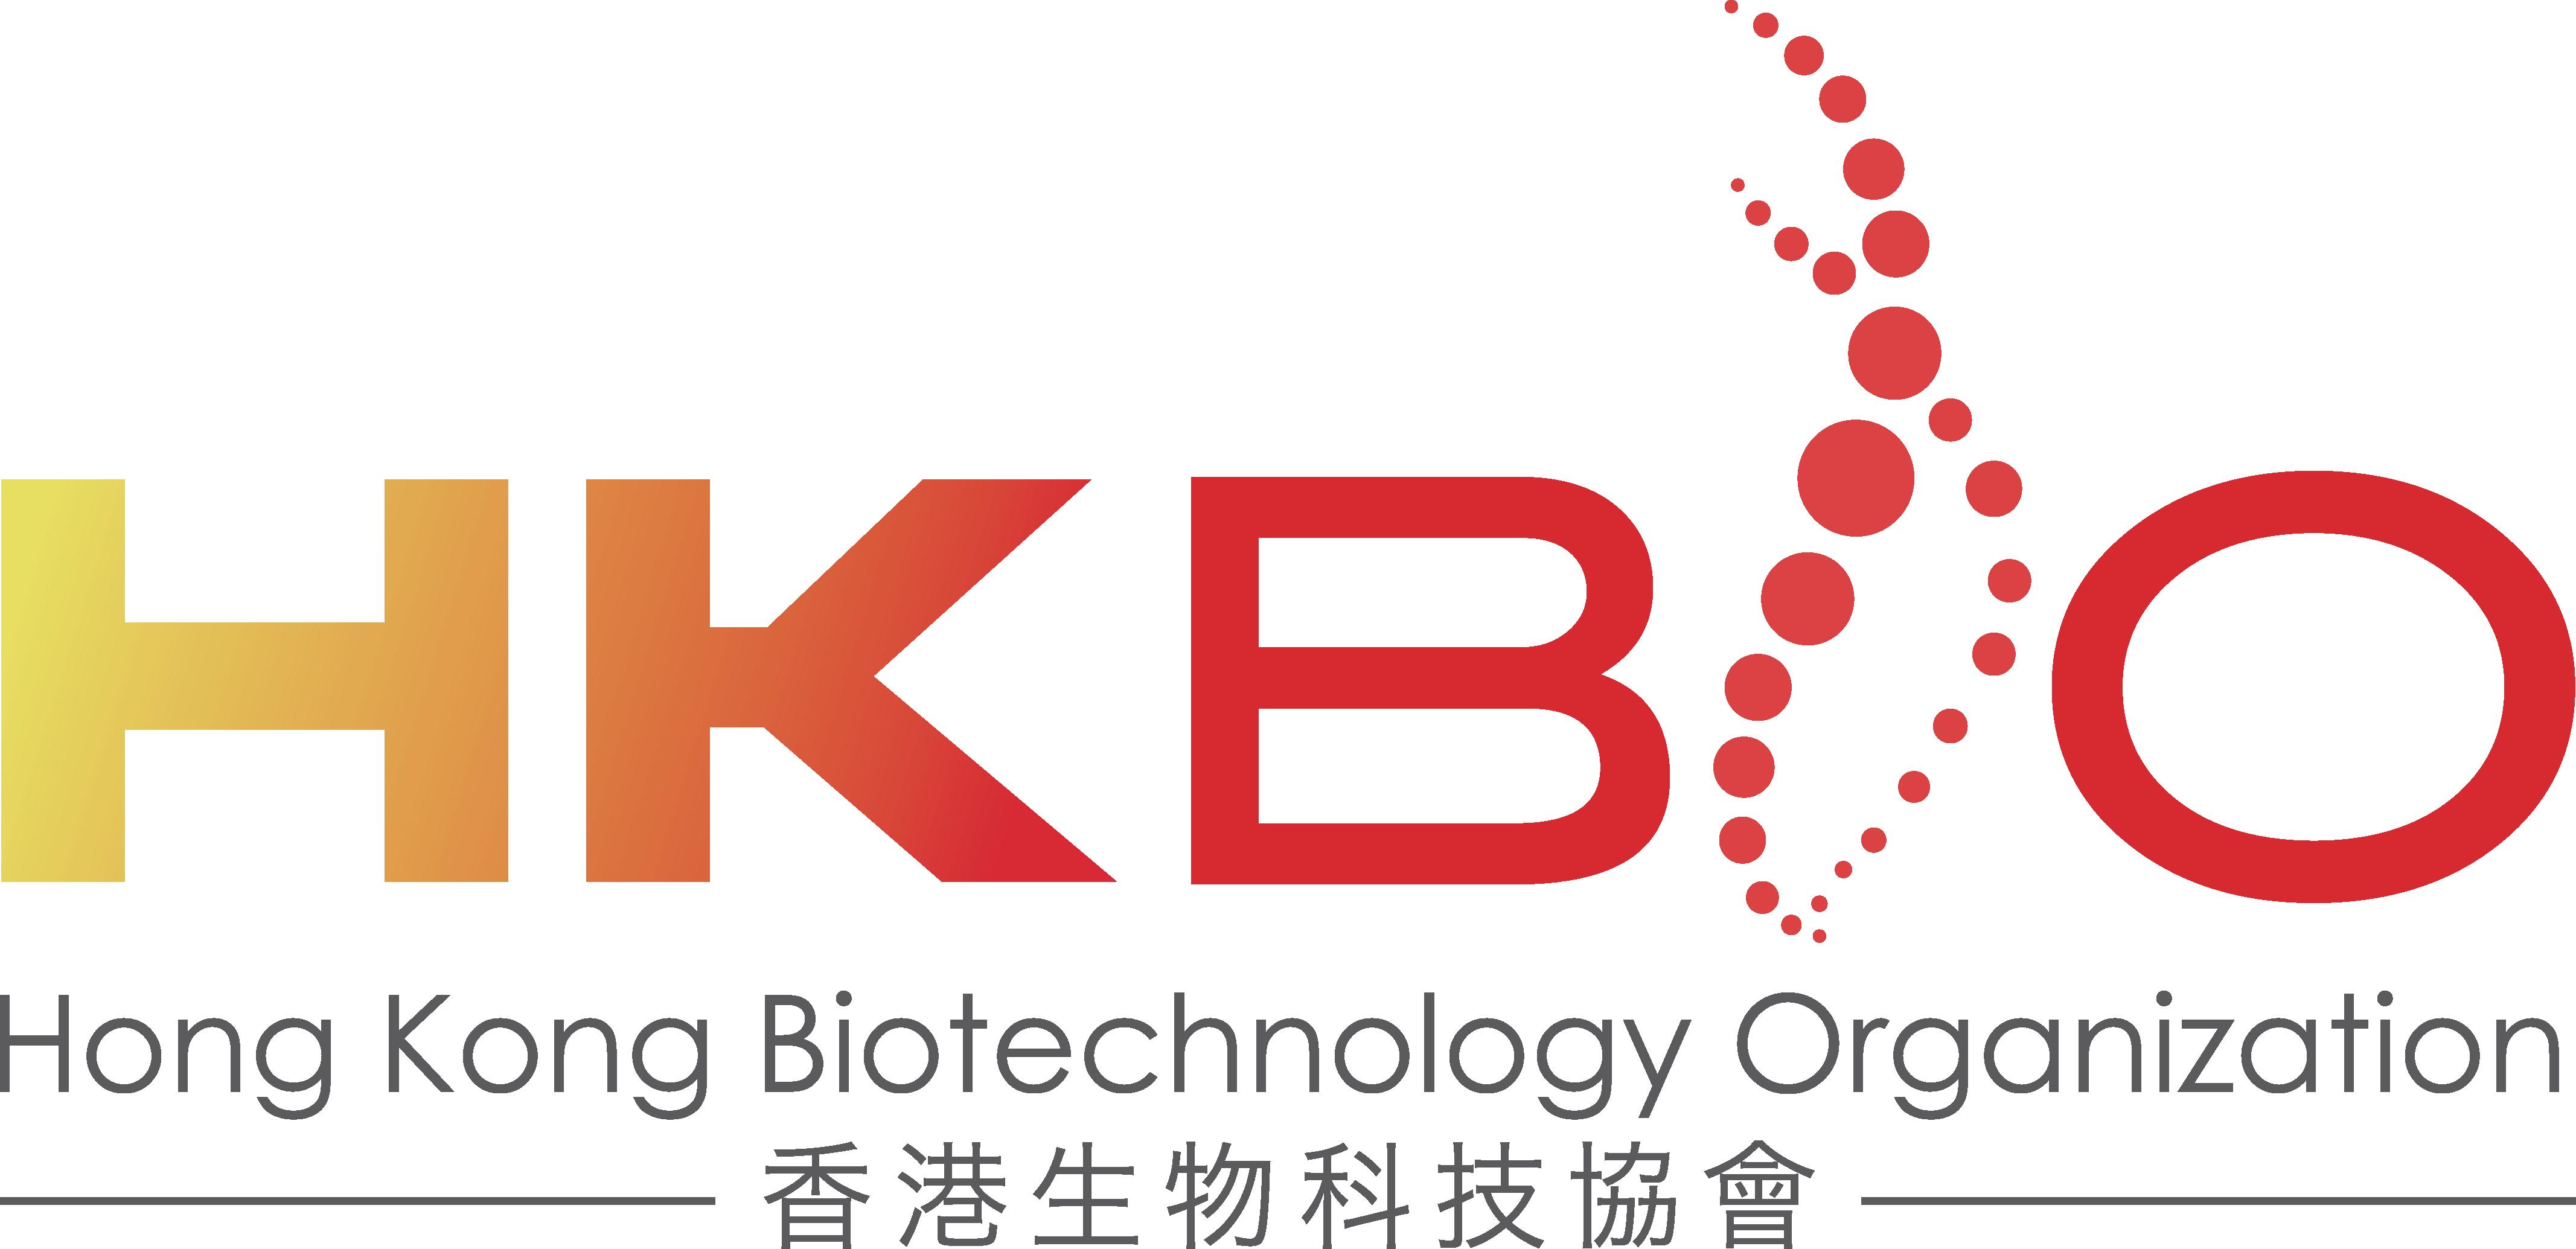 Hong Kong Biotechnology Organization